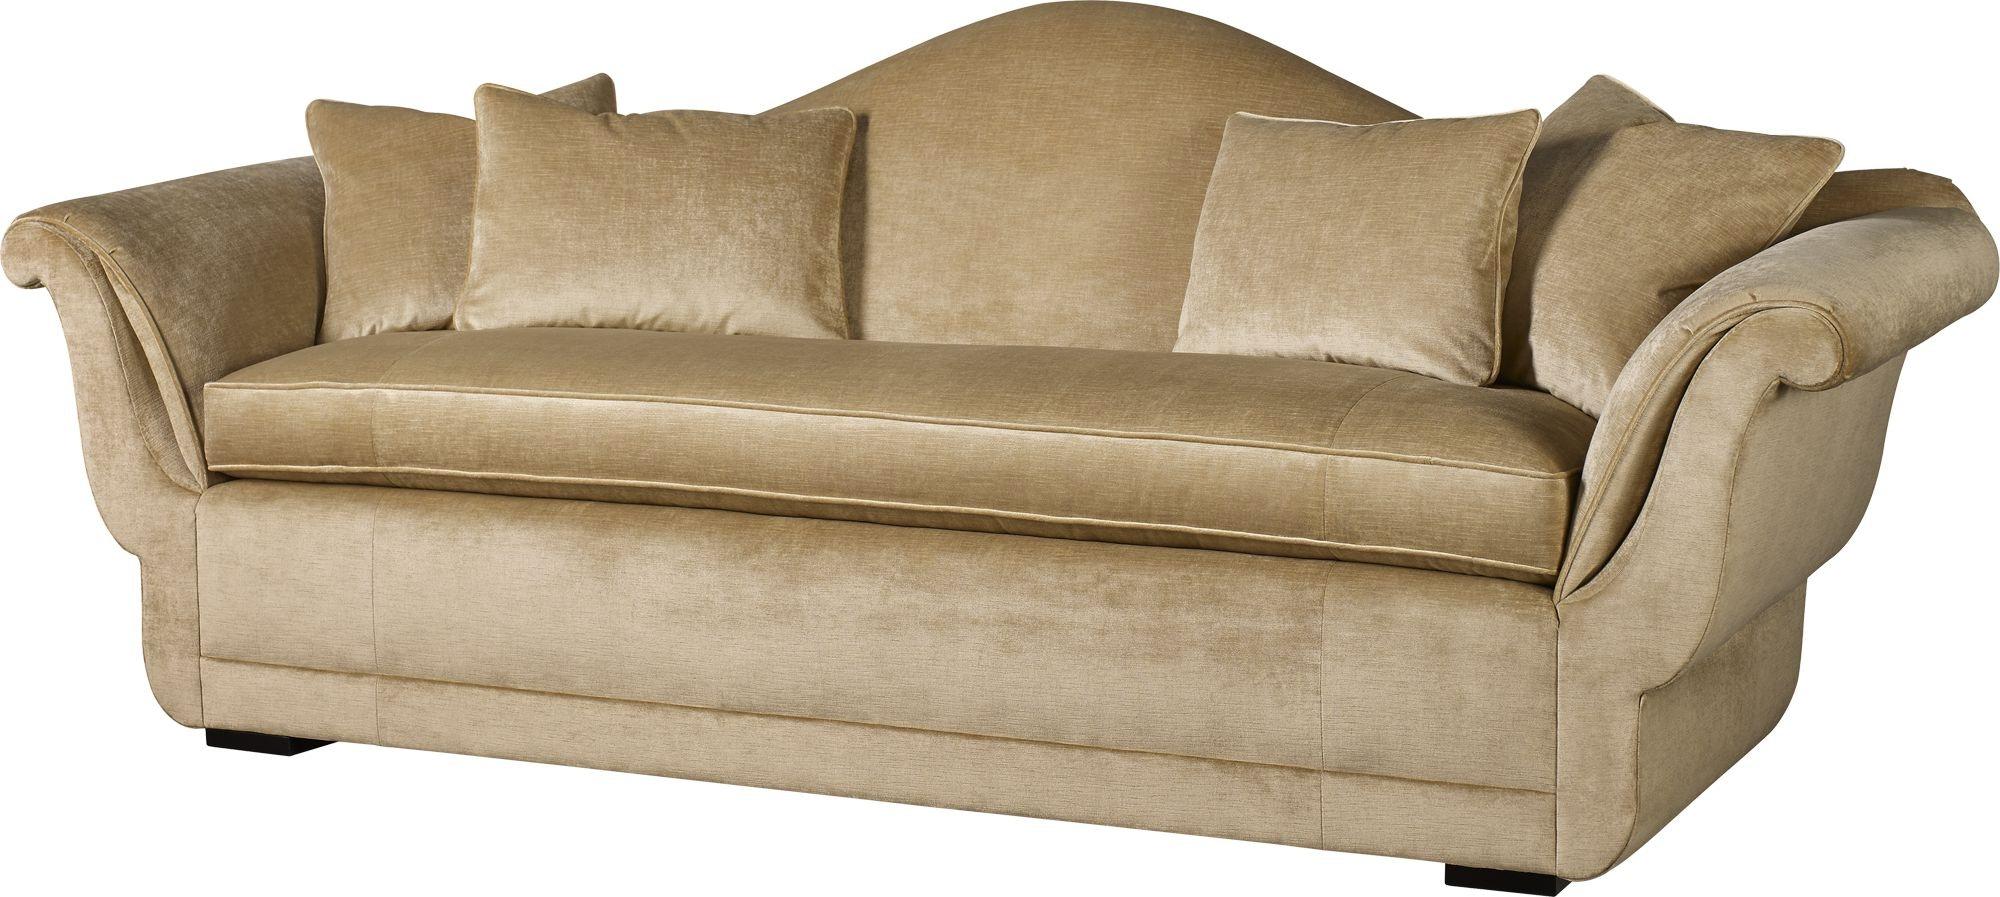 6584S. Baker Classics Upholstery Sepal Sofa